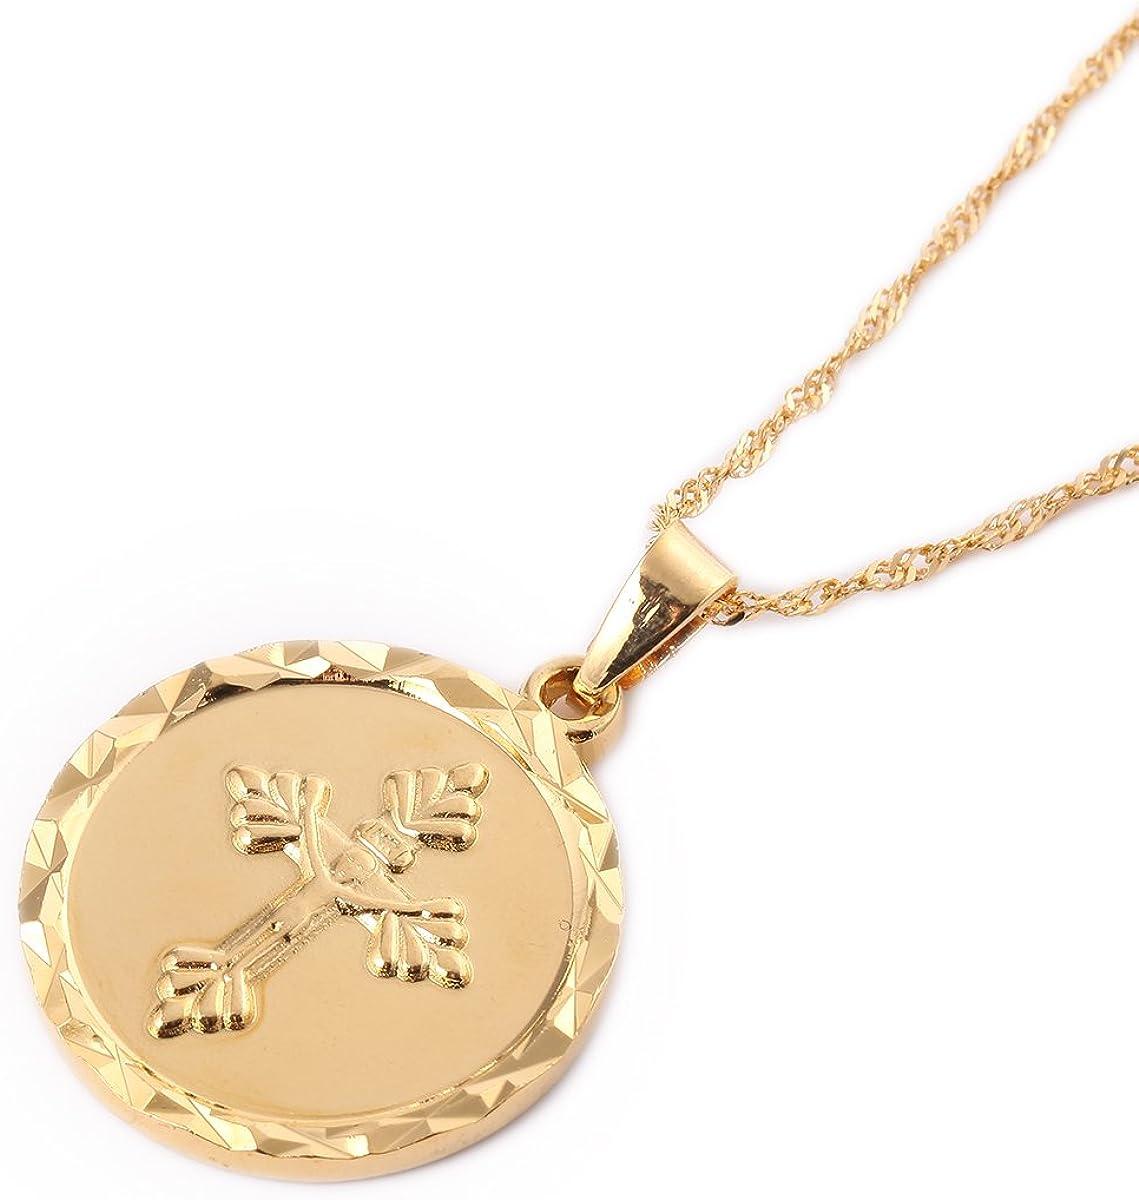 24K Gold Plated Catholic Round Medal Jesus Christ Crucifix Pendant Necklace Jewelry